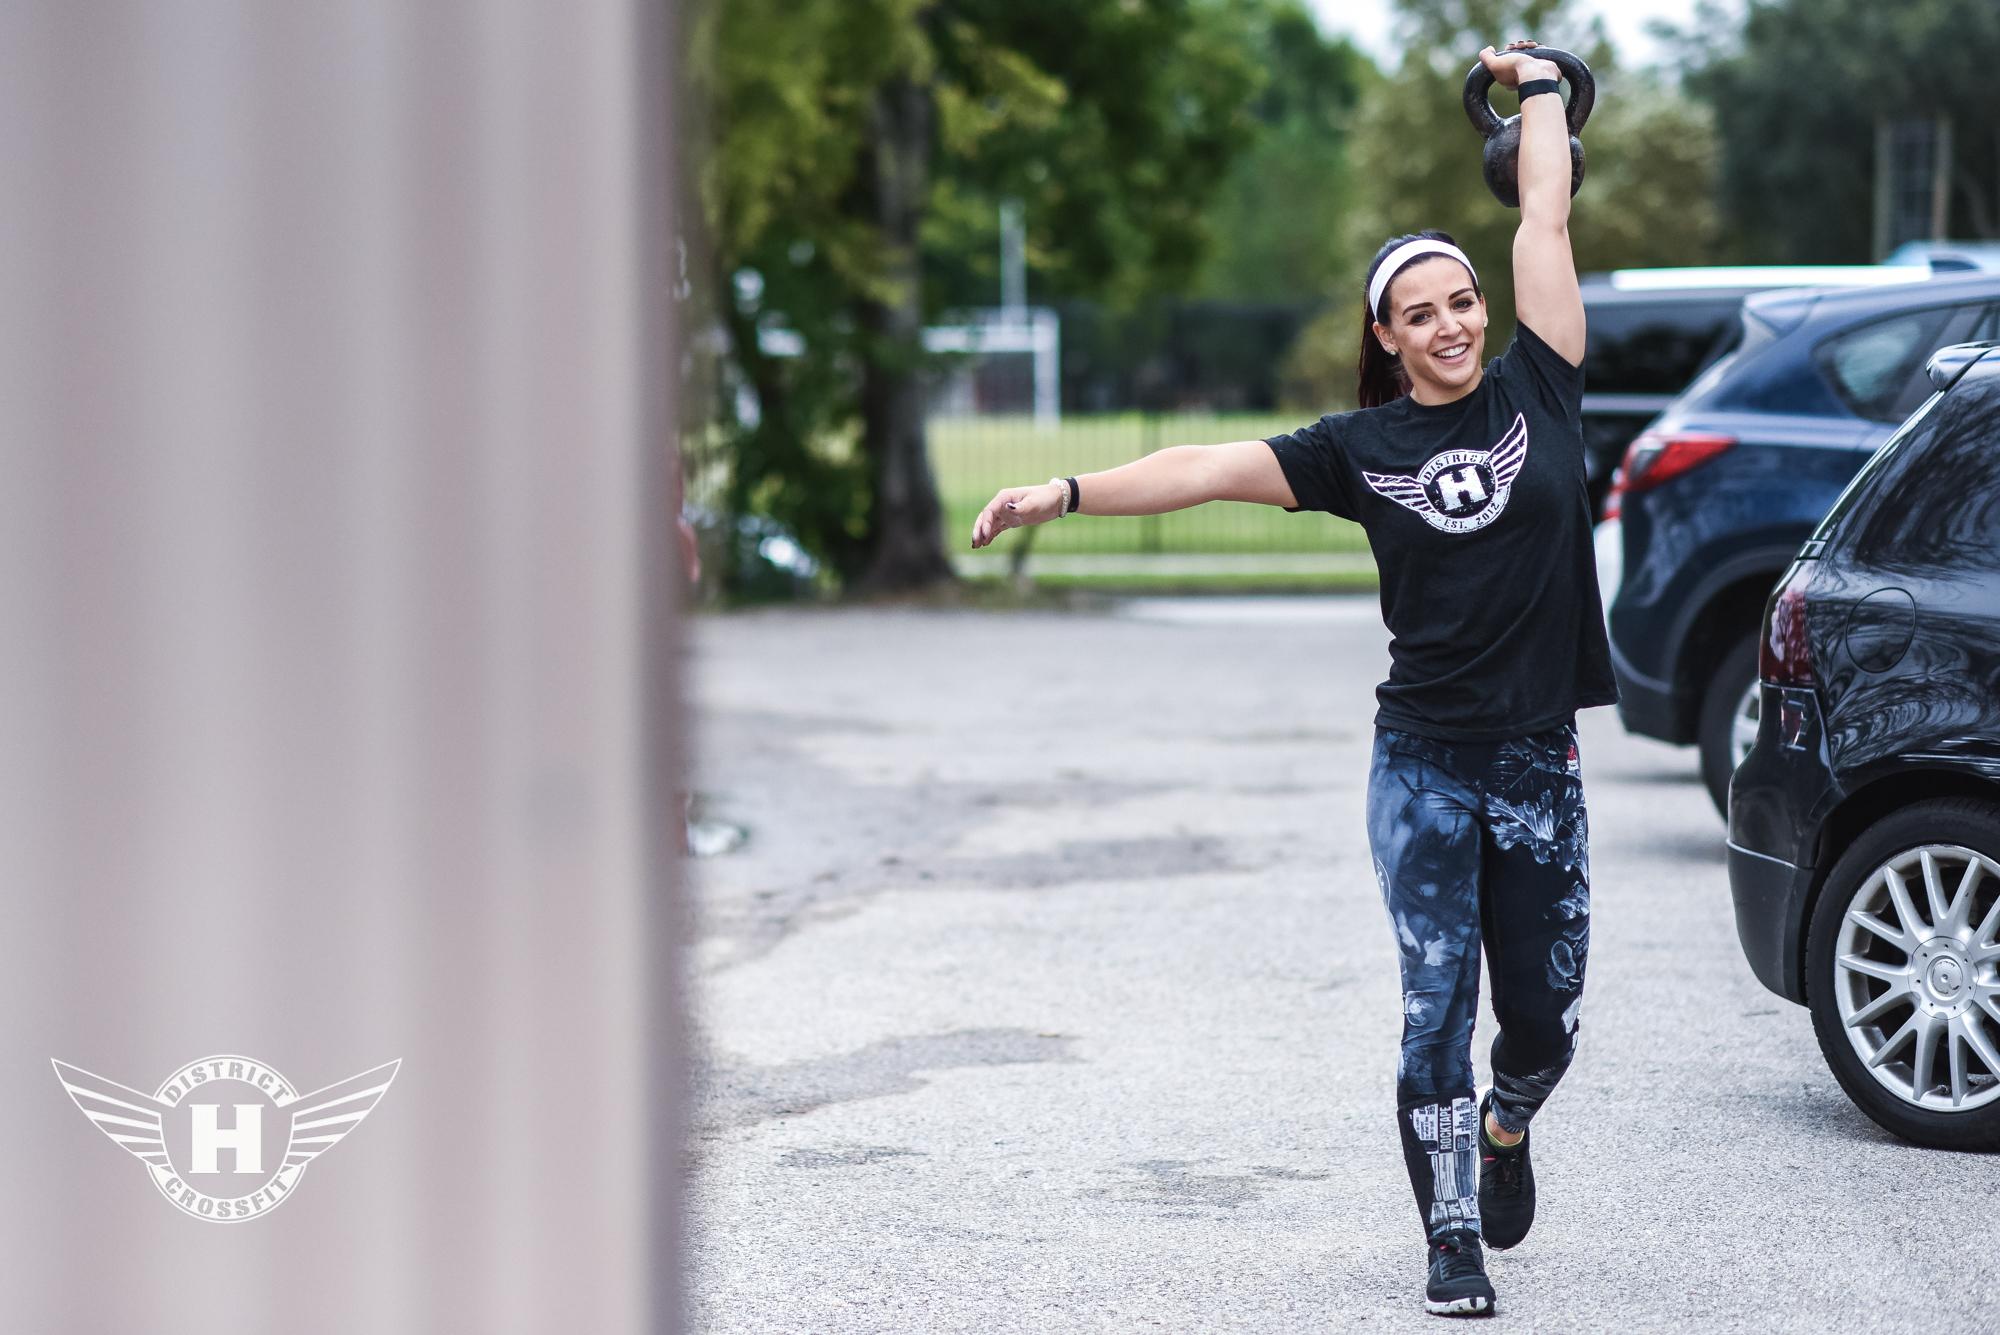 Overcoming the Mental Hurdles of Injury